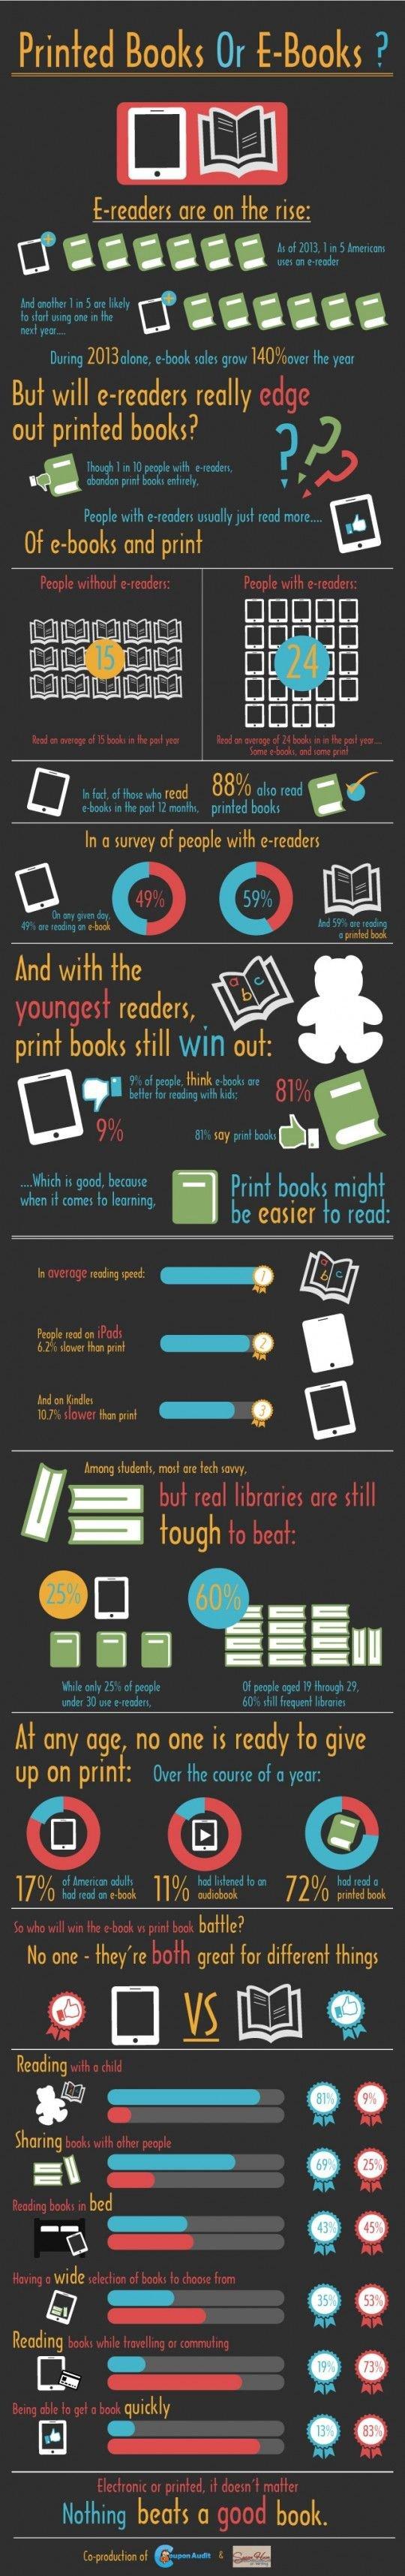 font,poster,screenshot,advertising,Printed,